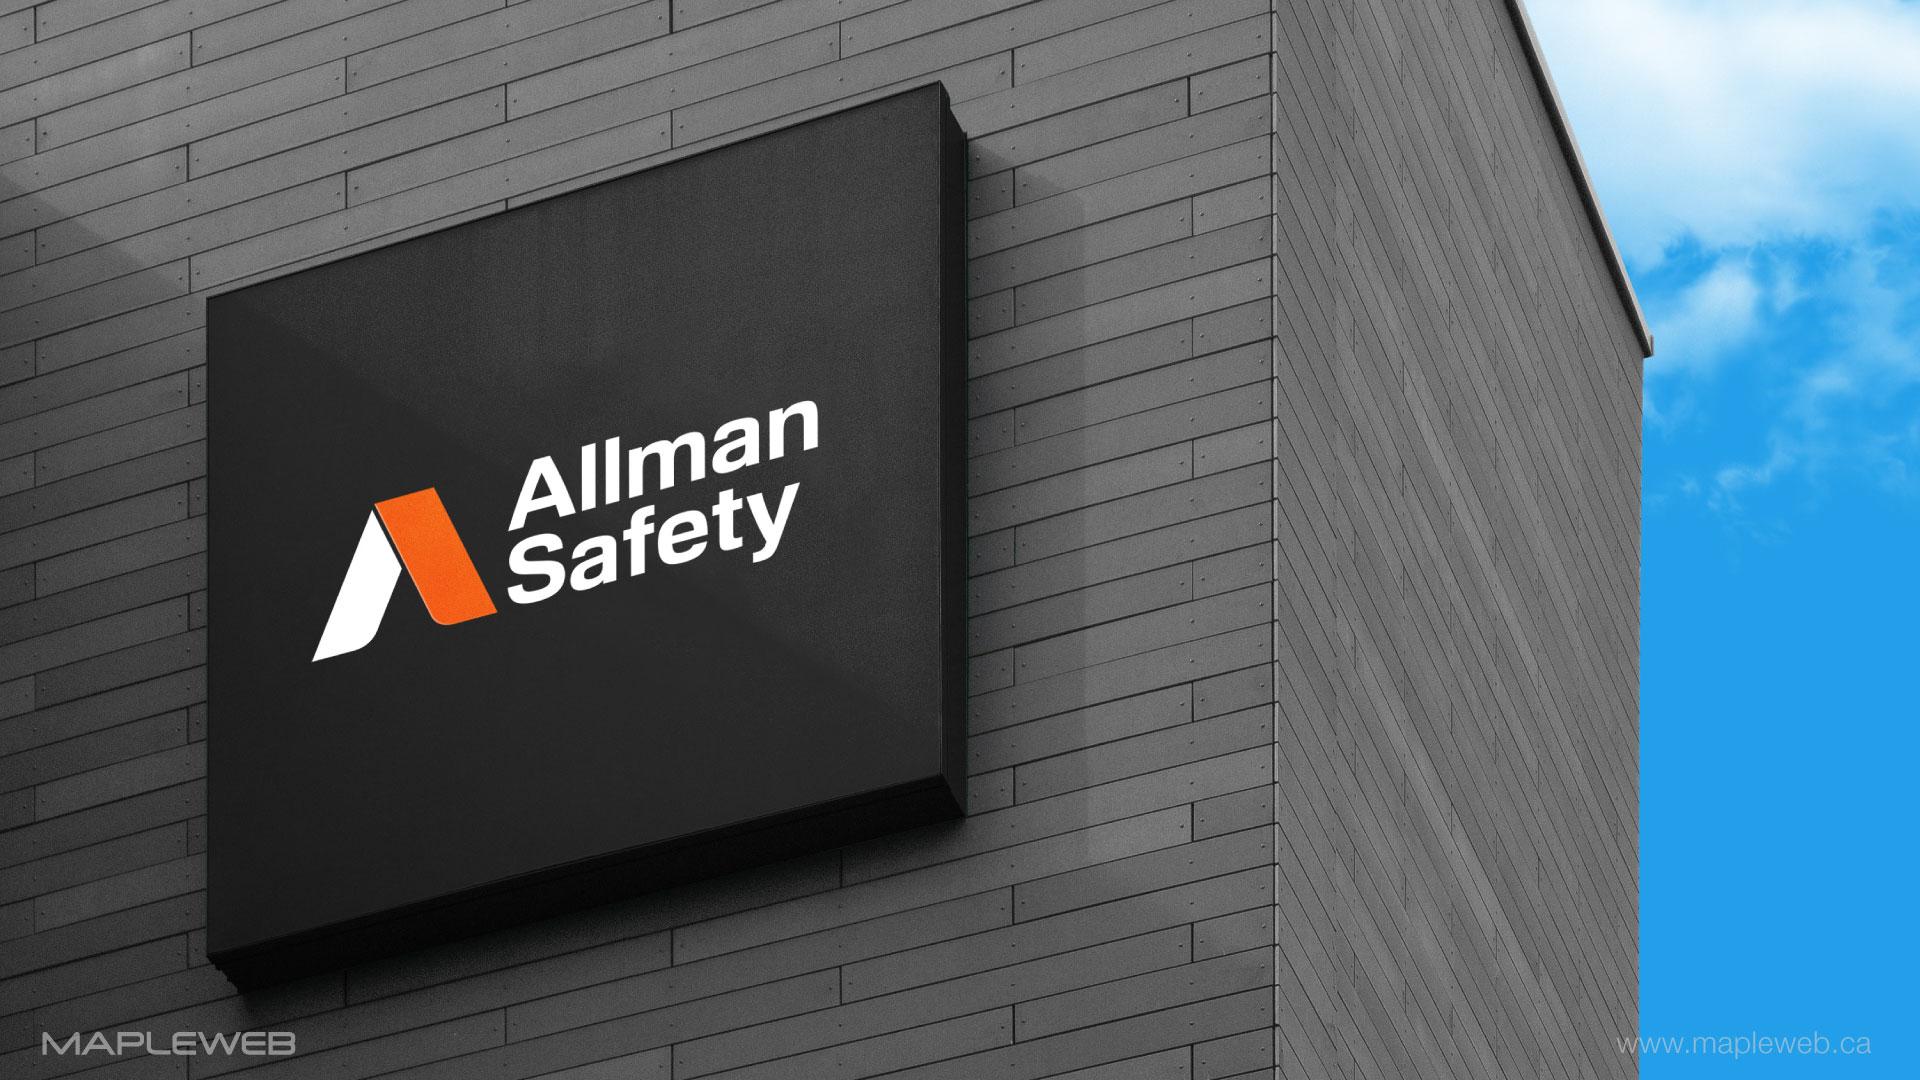 allman-safety-brand-logo-design-by-mapleweb-vancouver-canada-logo-on-building-mock